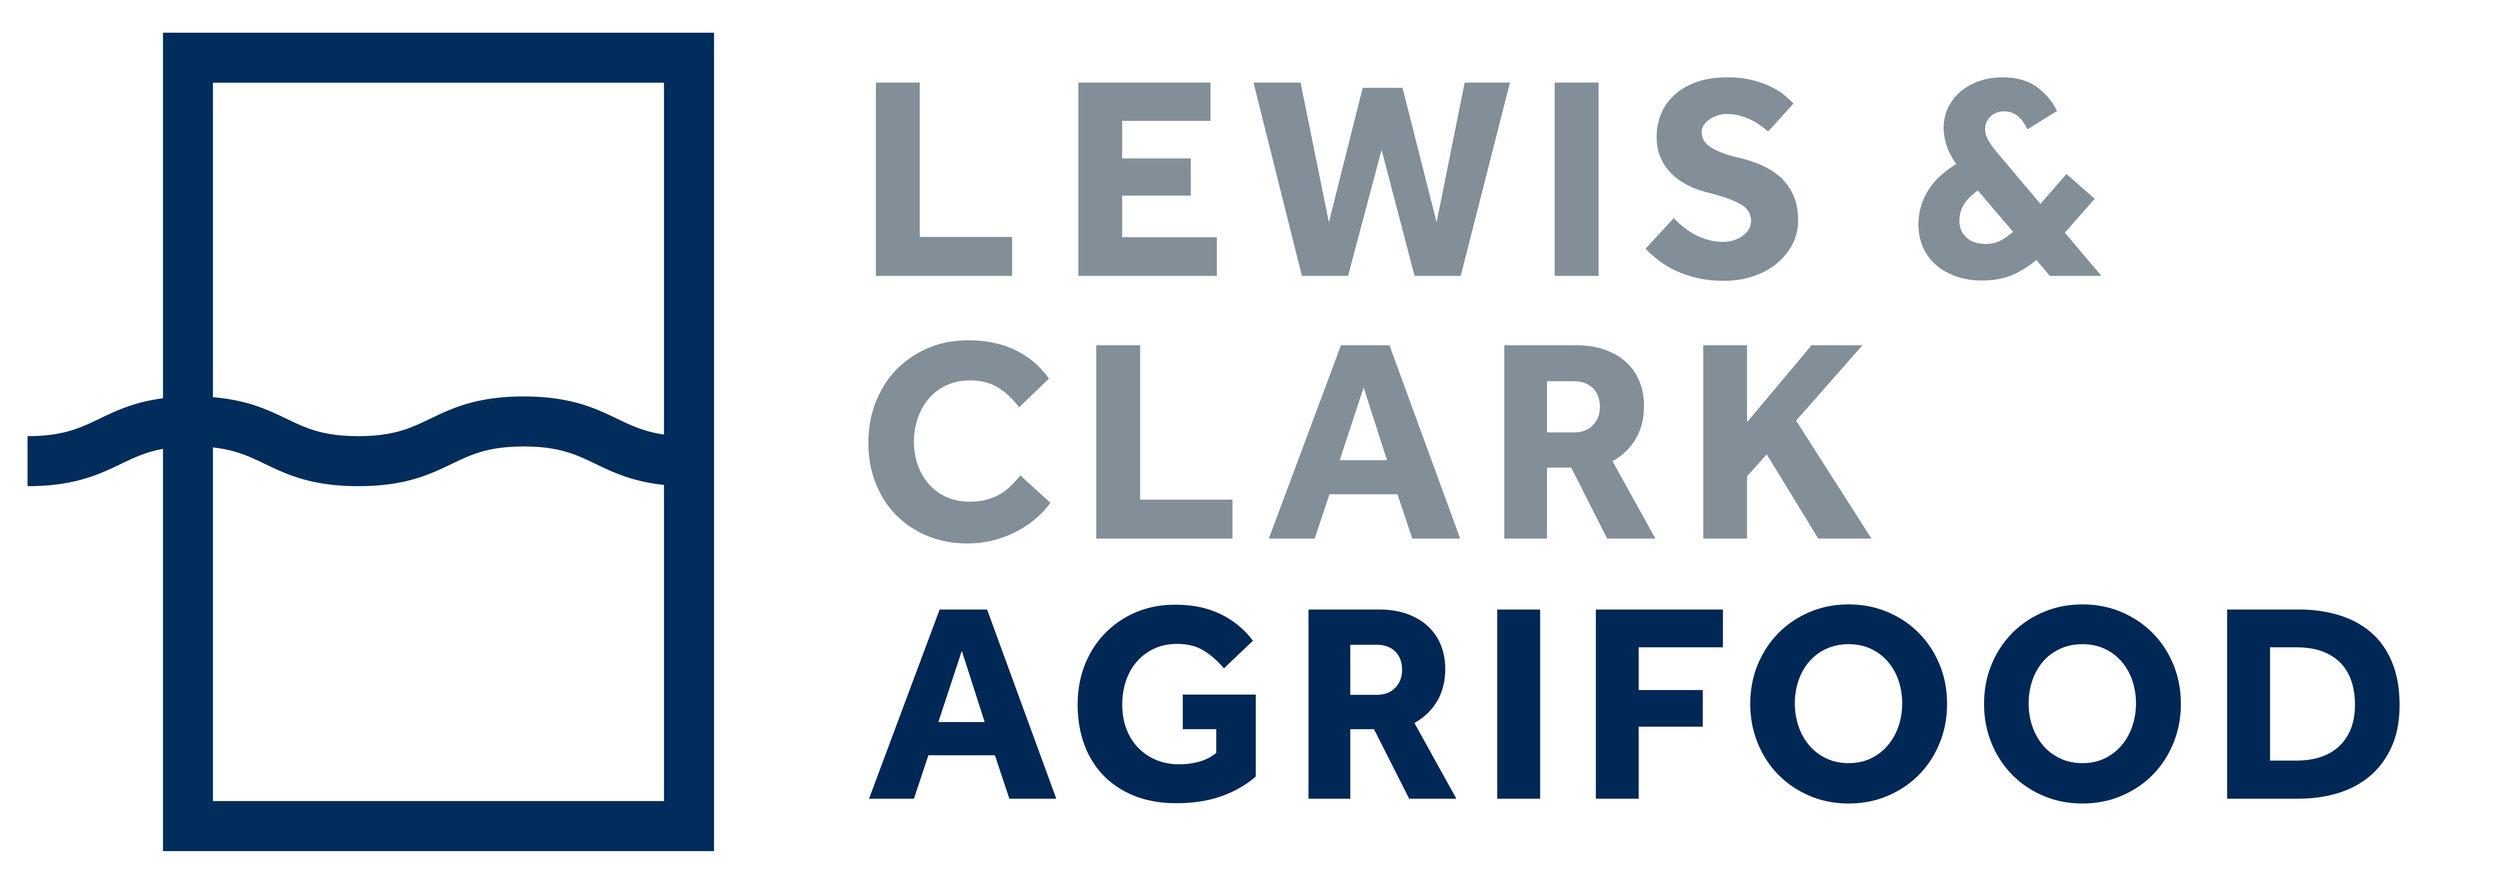 LAC-Agrifood-Logo(FINAL) (1).jpg